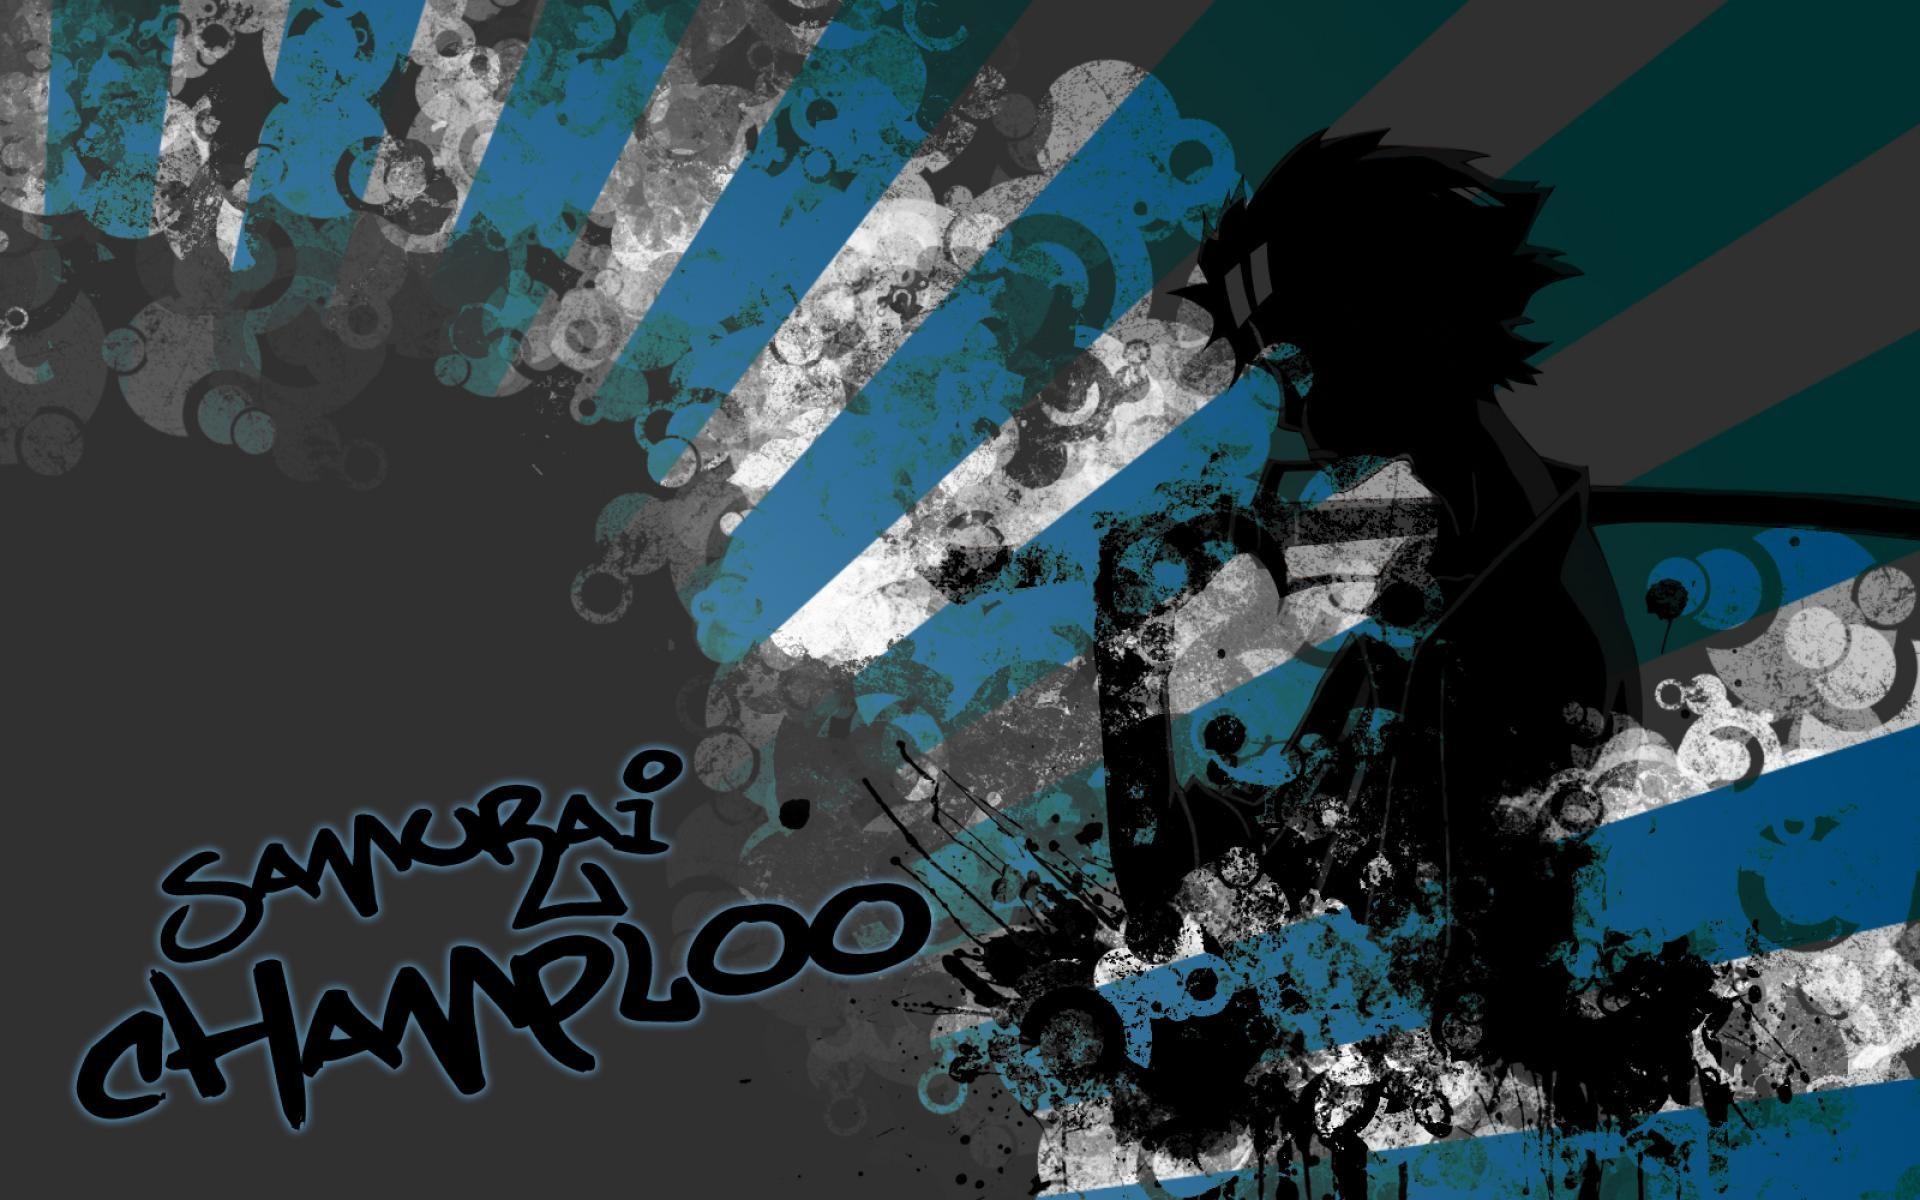 Samurai Champloo Silhouette Wallpaper